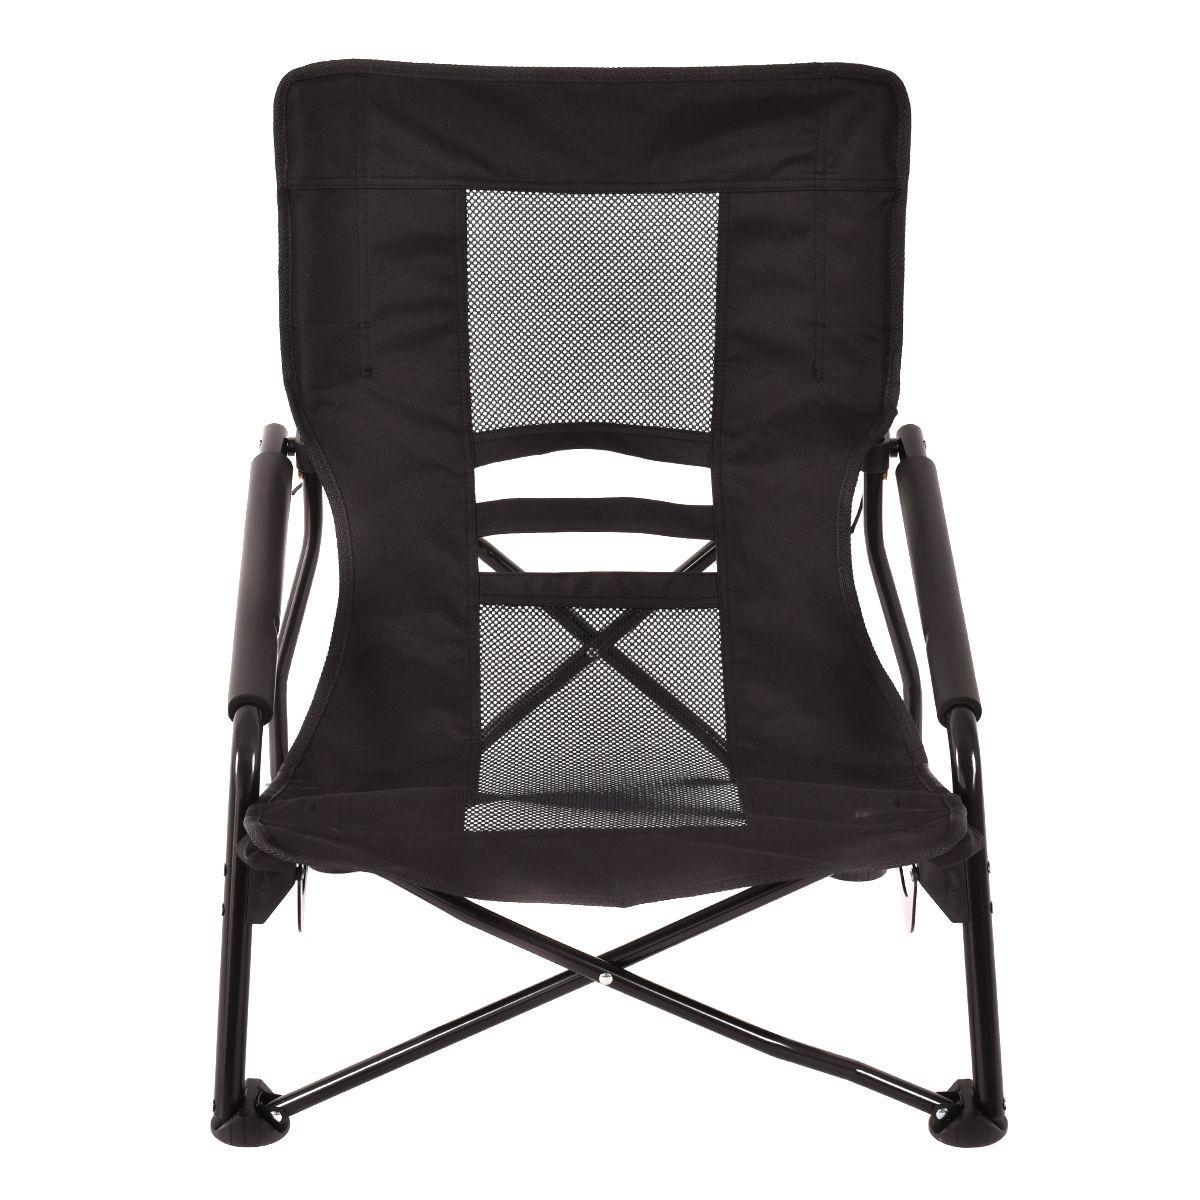 Outdoor High Back Folding Beach Chair-Black